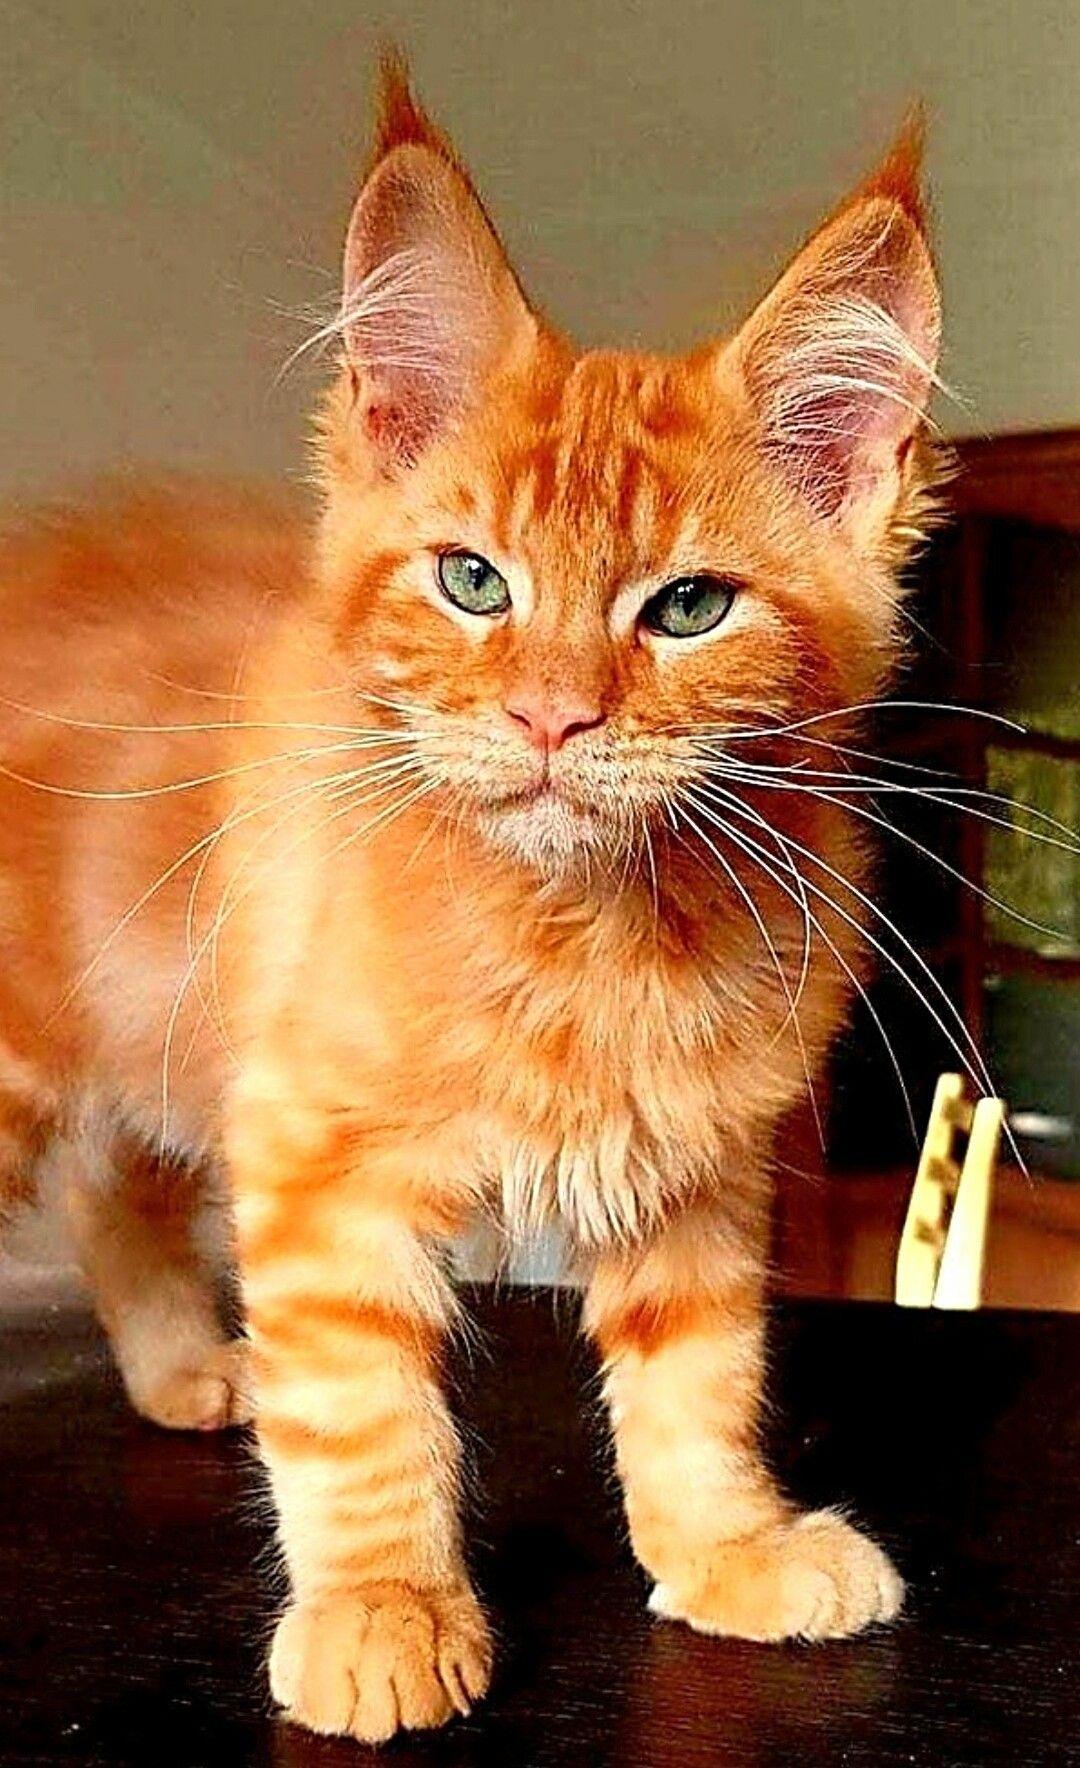 Gorgeous Orange Tabby Kitten Tabby Kitten Orange Tabby Kitten Tabby Cat